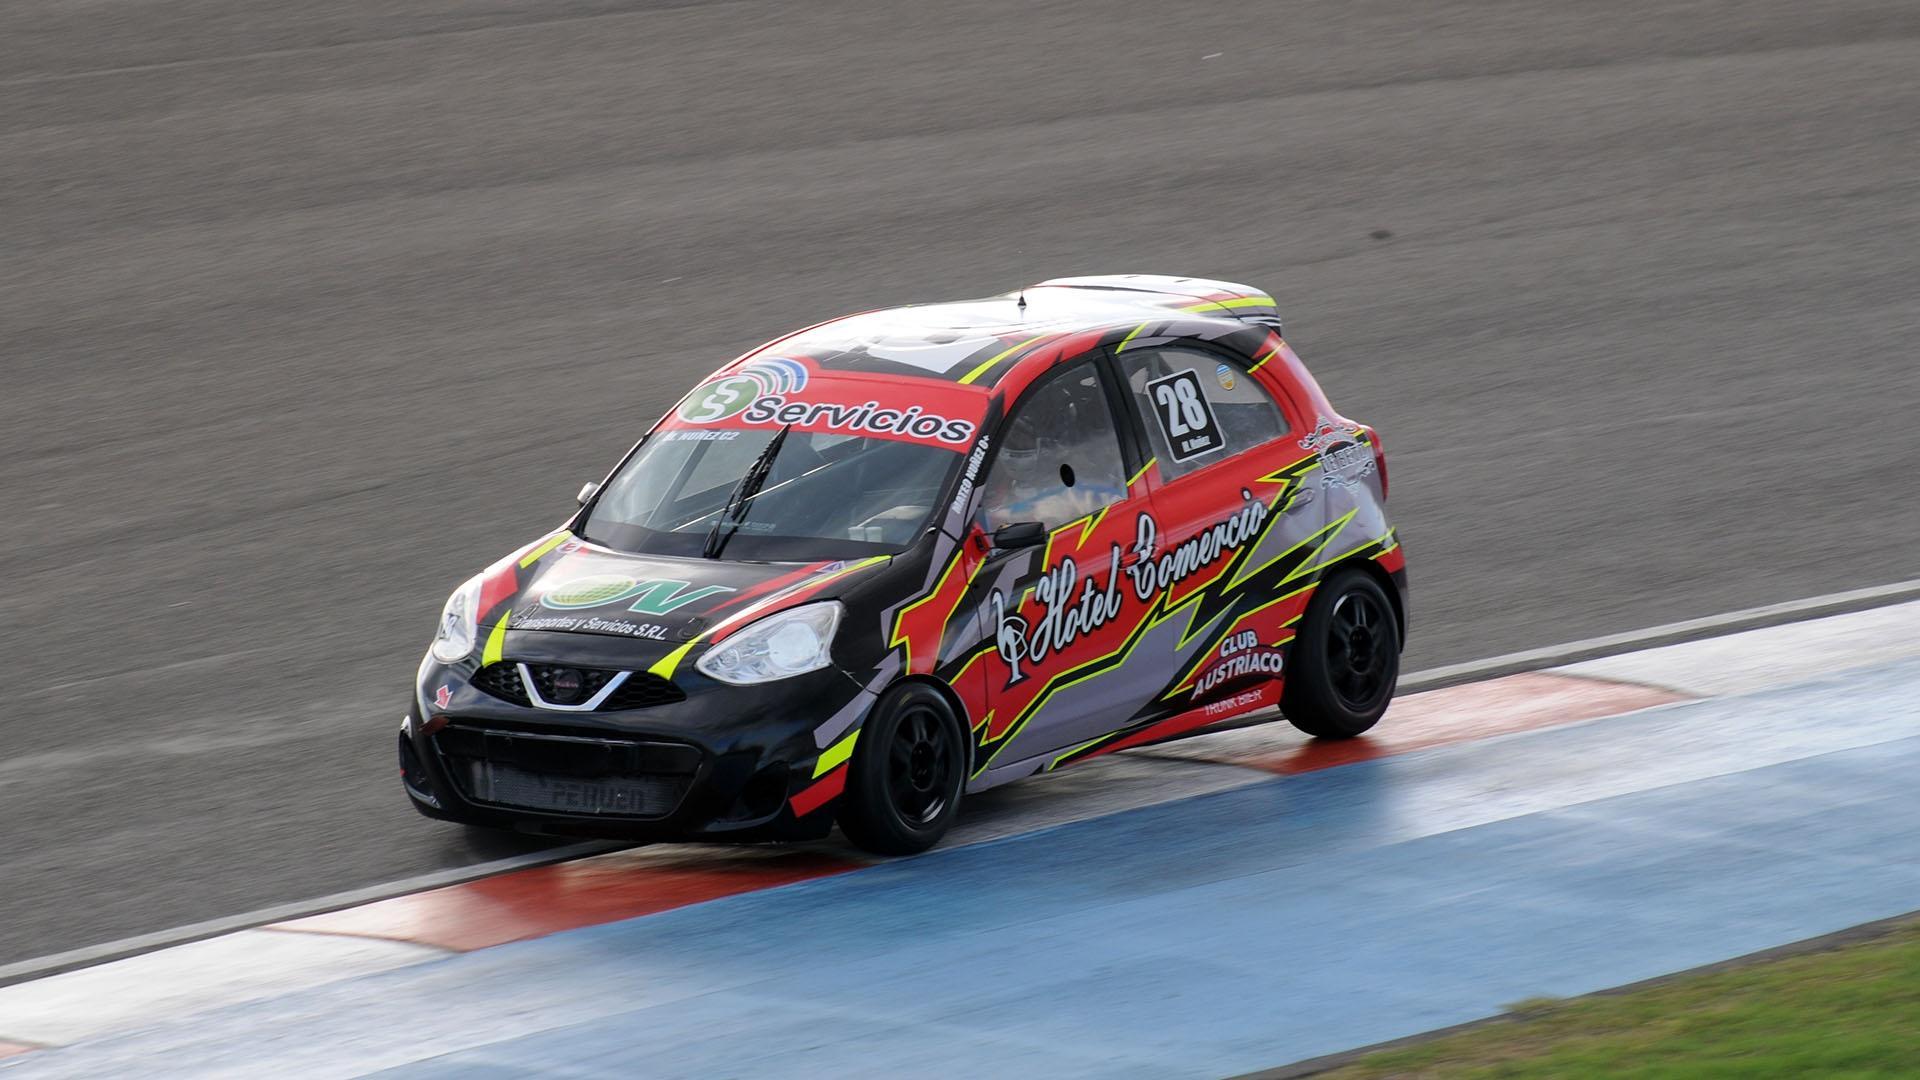 Alquat Motorsport probó en Buenos Aires